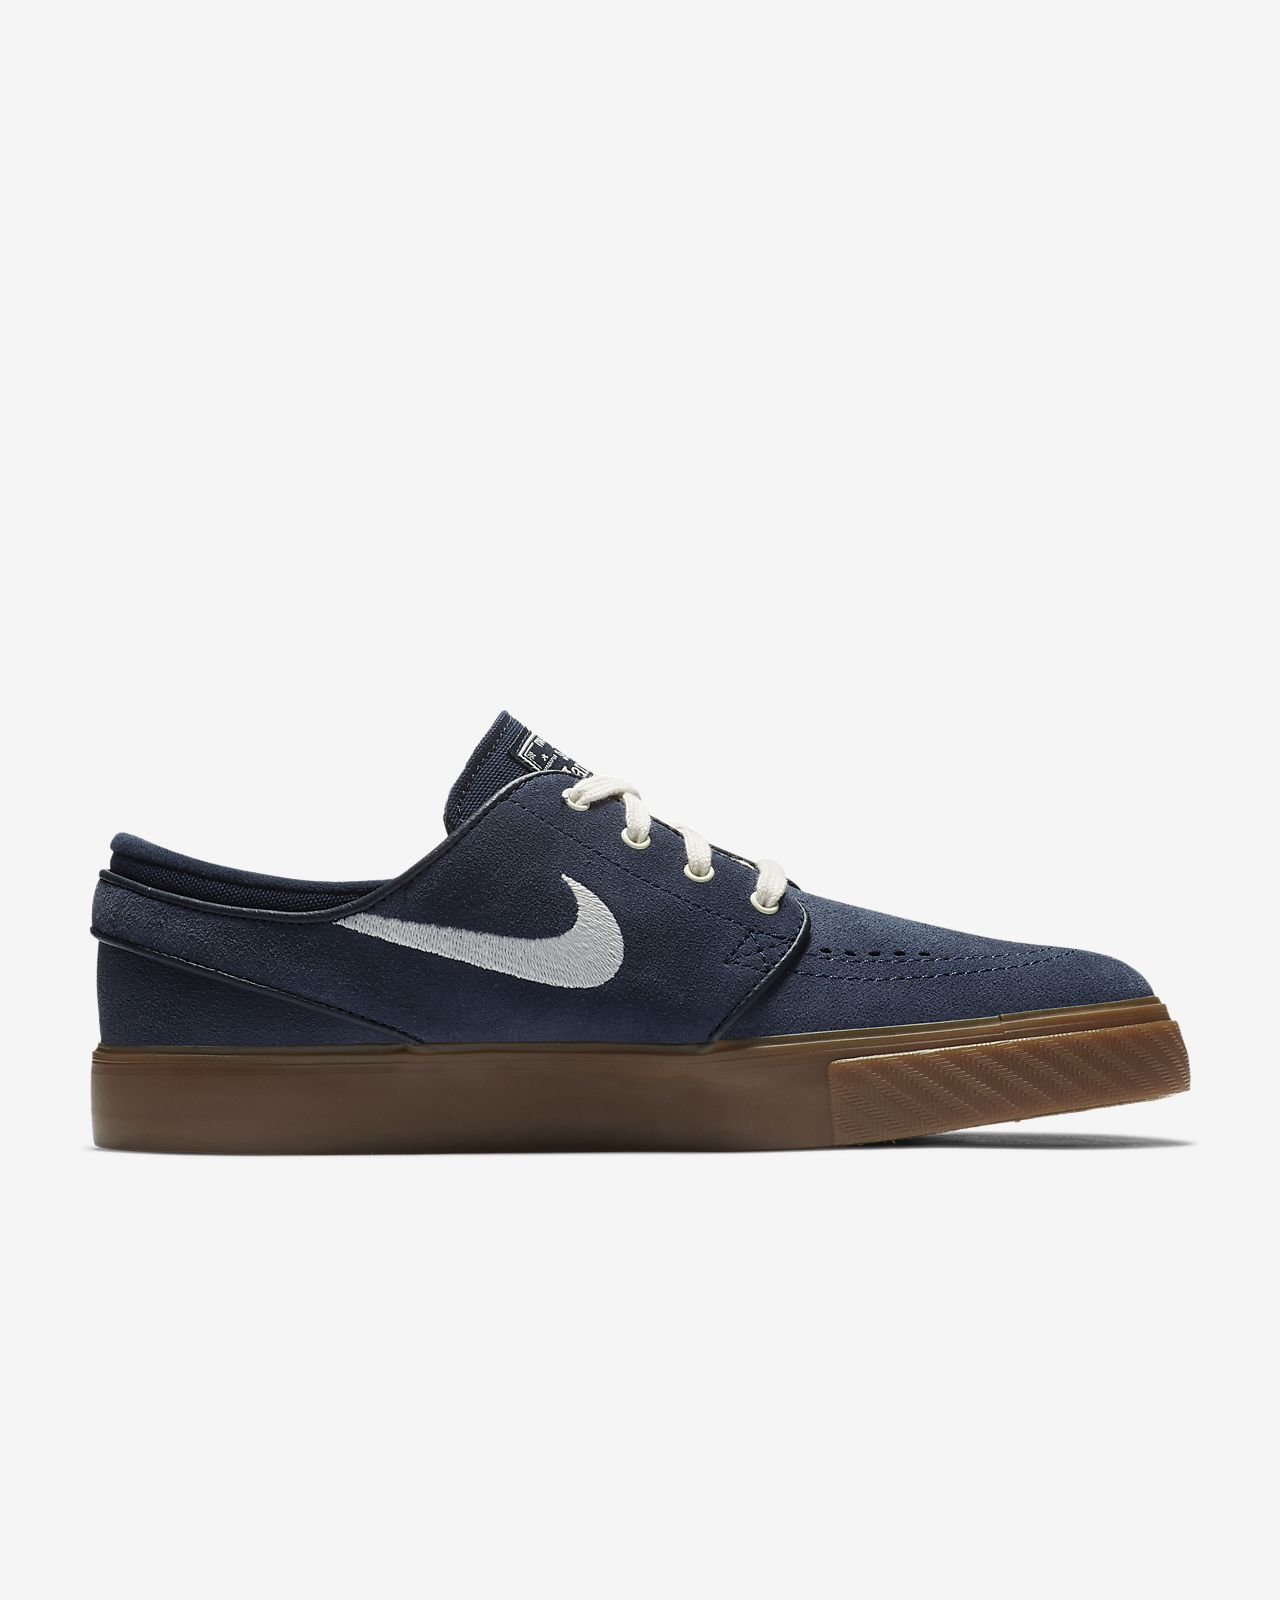 06357b700c9e6 Chaussure de skateboard Nike Zoom Stefan Janoski pour Femme. Nike.com CA